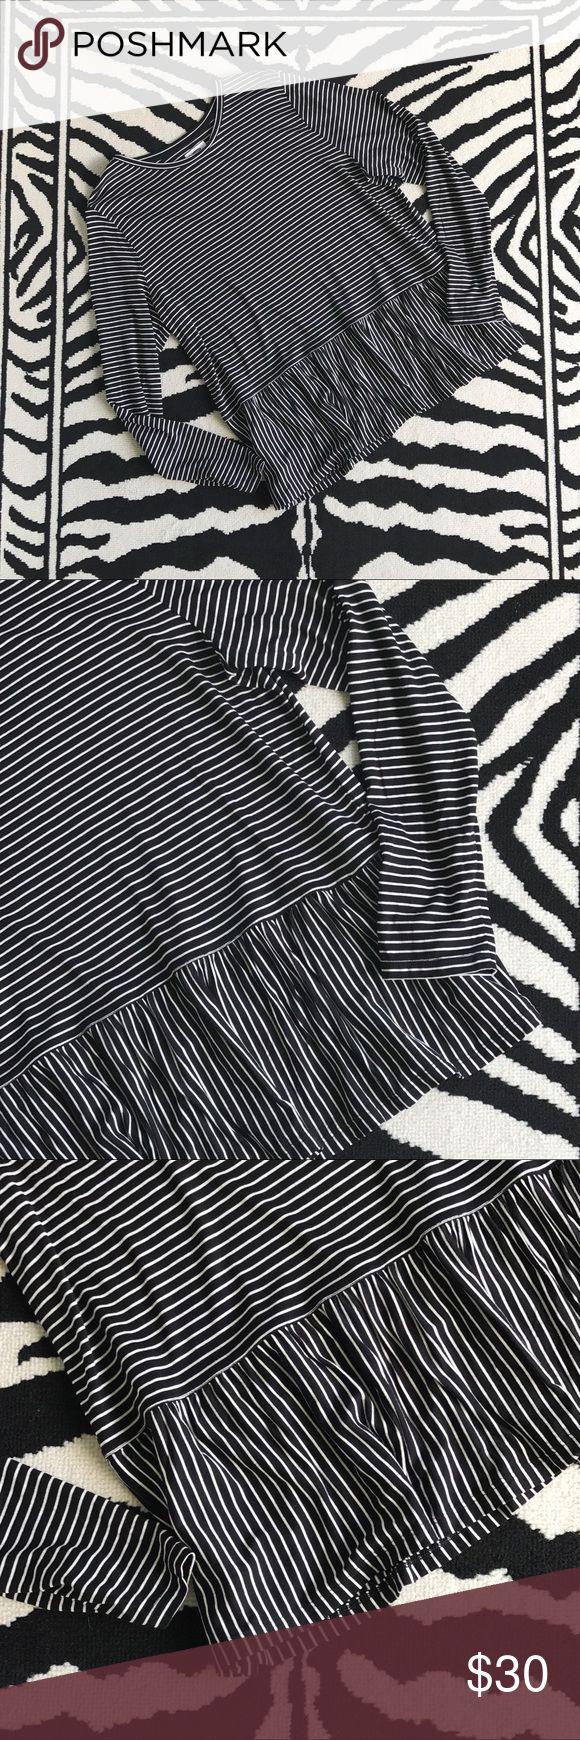 B & W Striped Peplum Top Black and White Striped Peplum Top. Long sleeved, scoop neck, peplum pleated detailing hemline with alternate stripe detailing. Old Navy Tops Tees - Long Sleeve